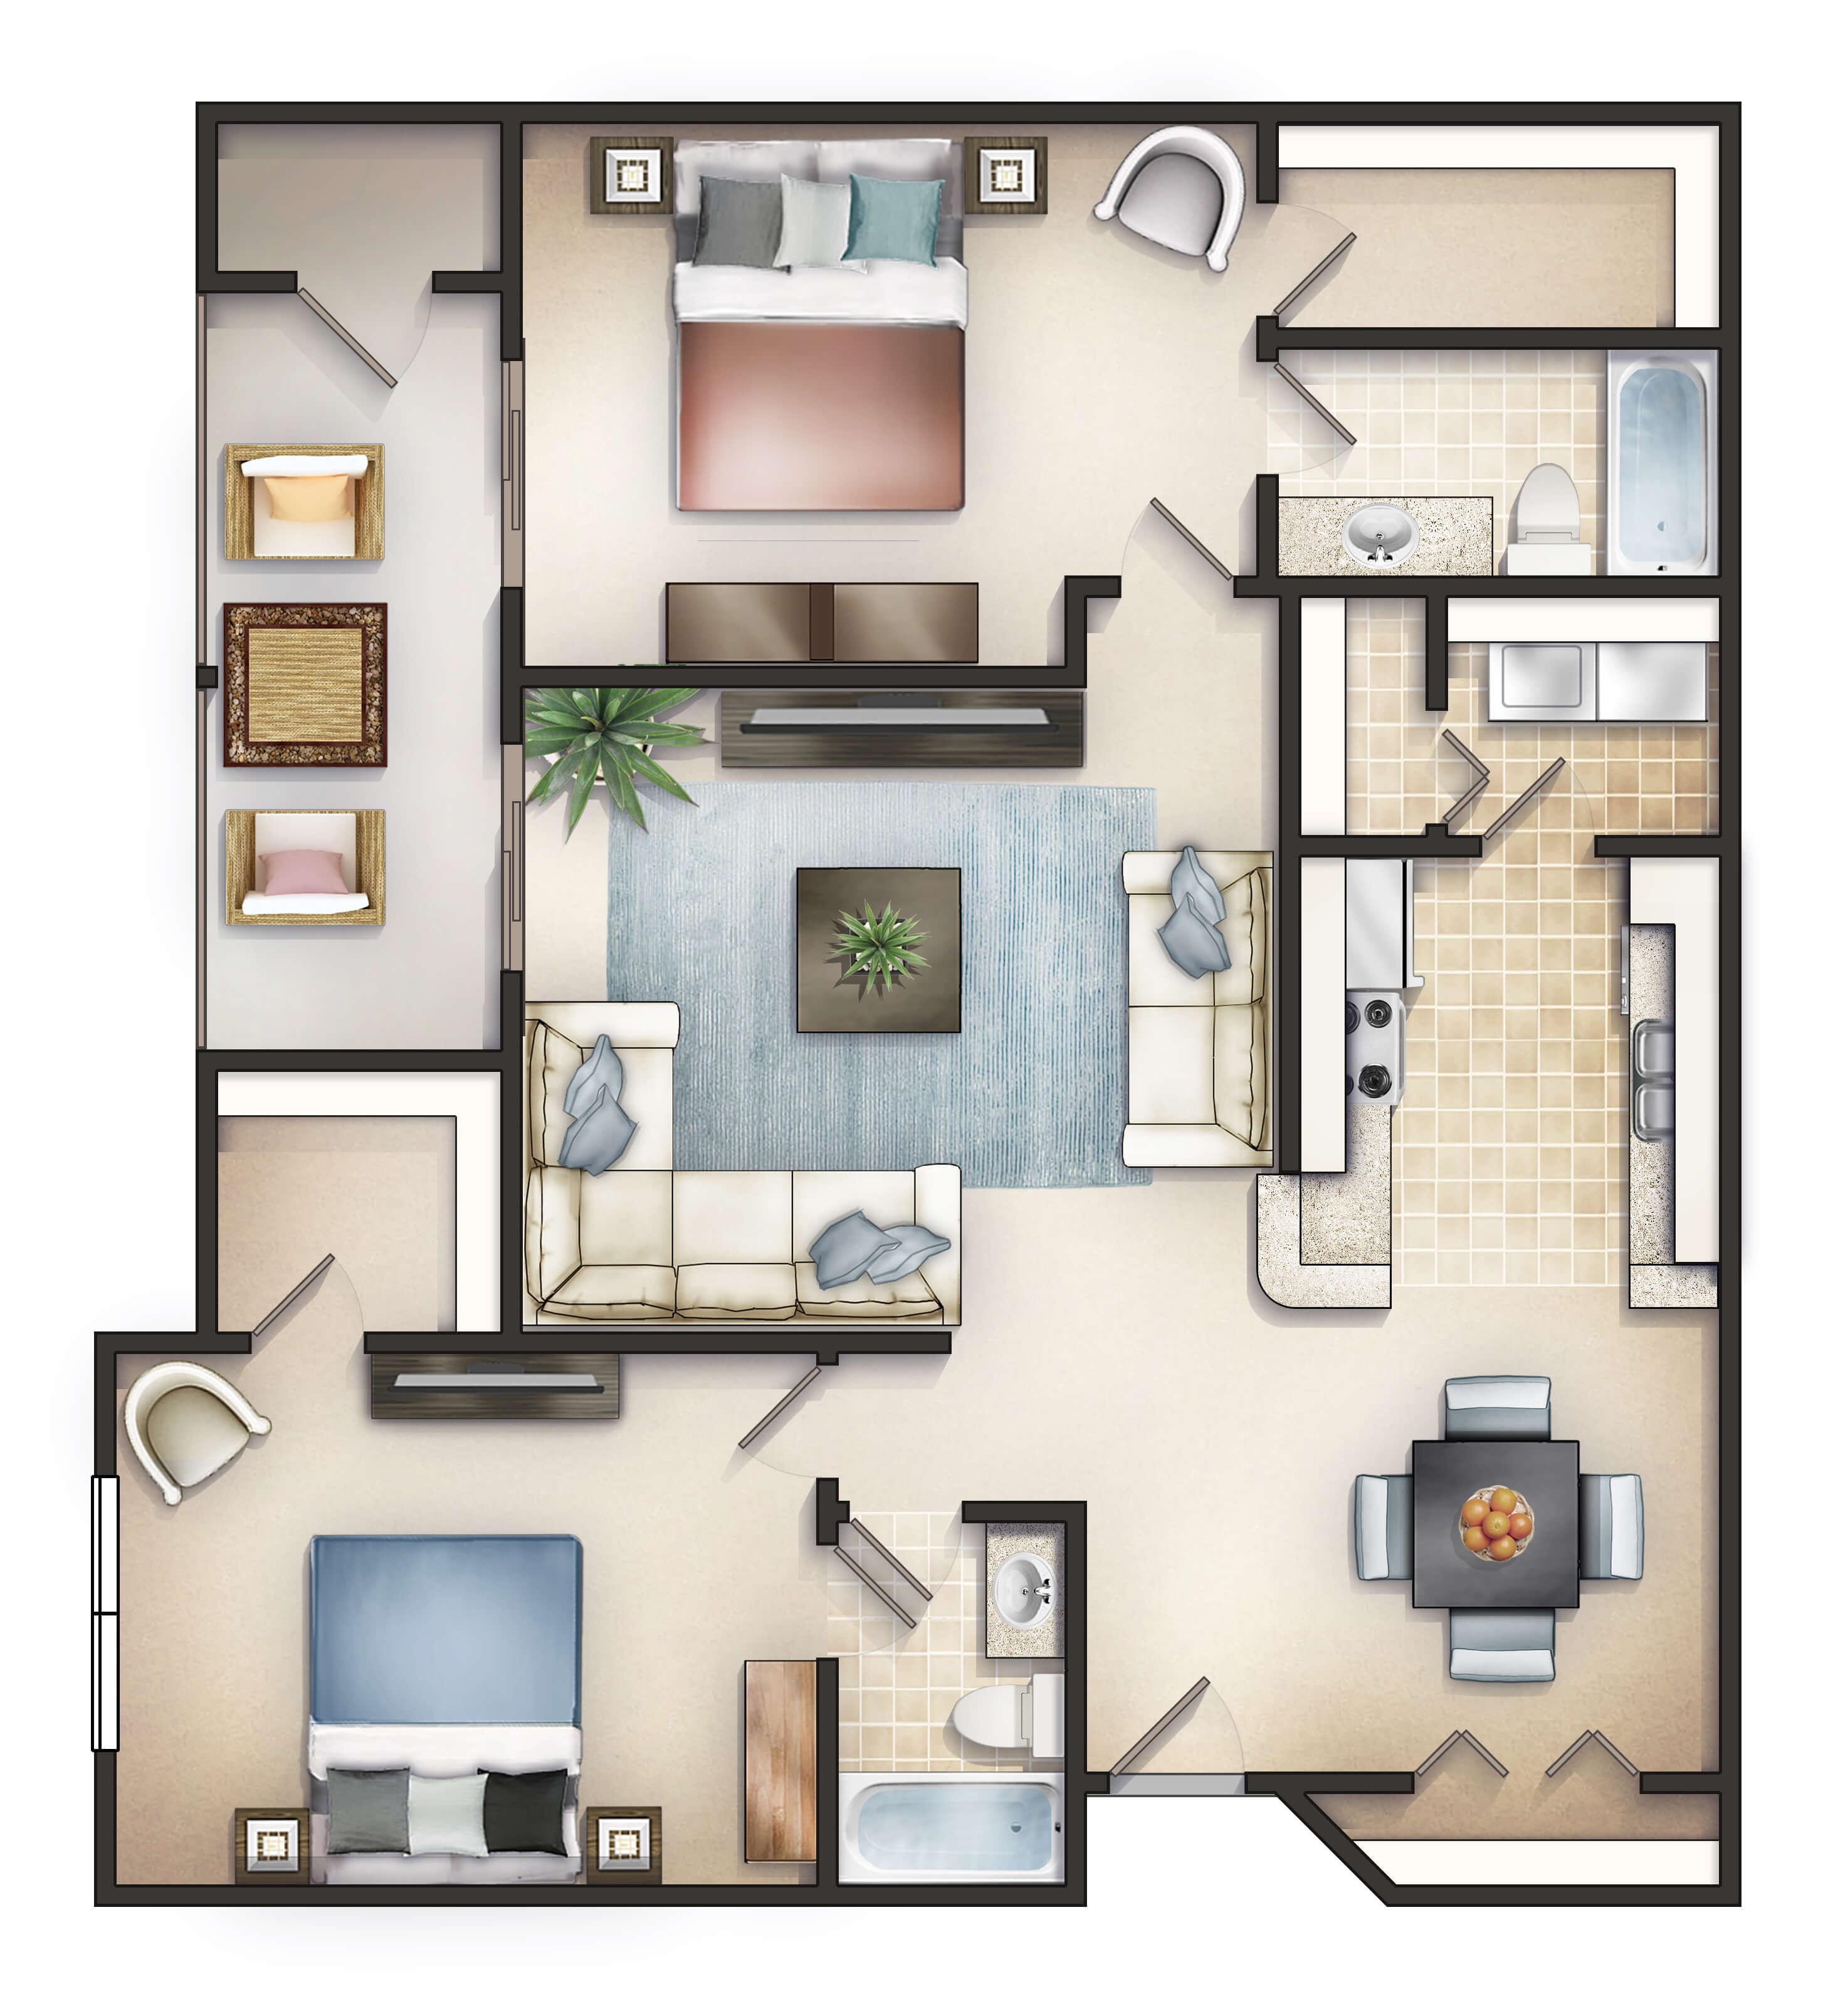 Greenbrier Apartments 100 Willow Oak Drive, Columbia SC 29223